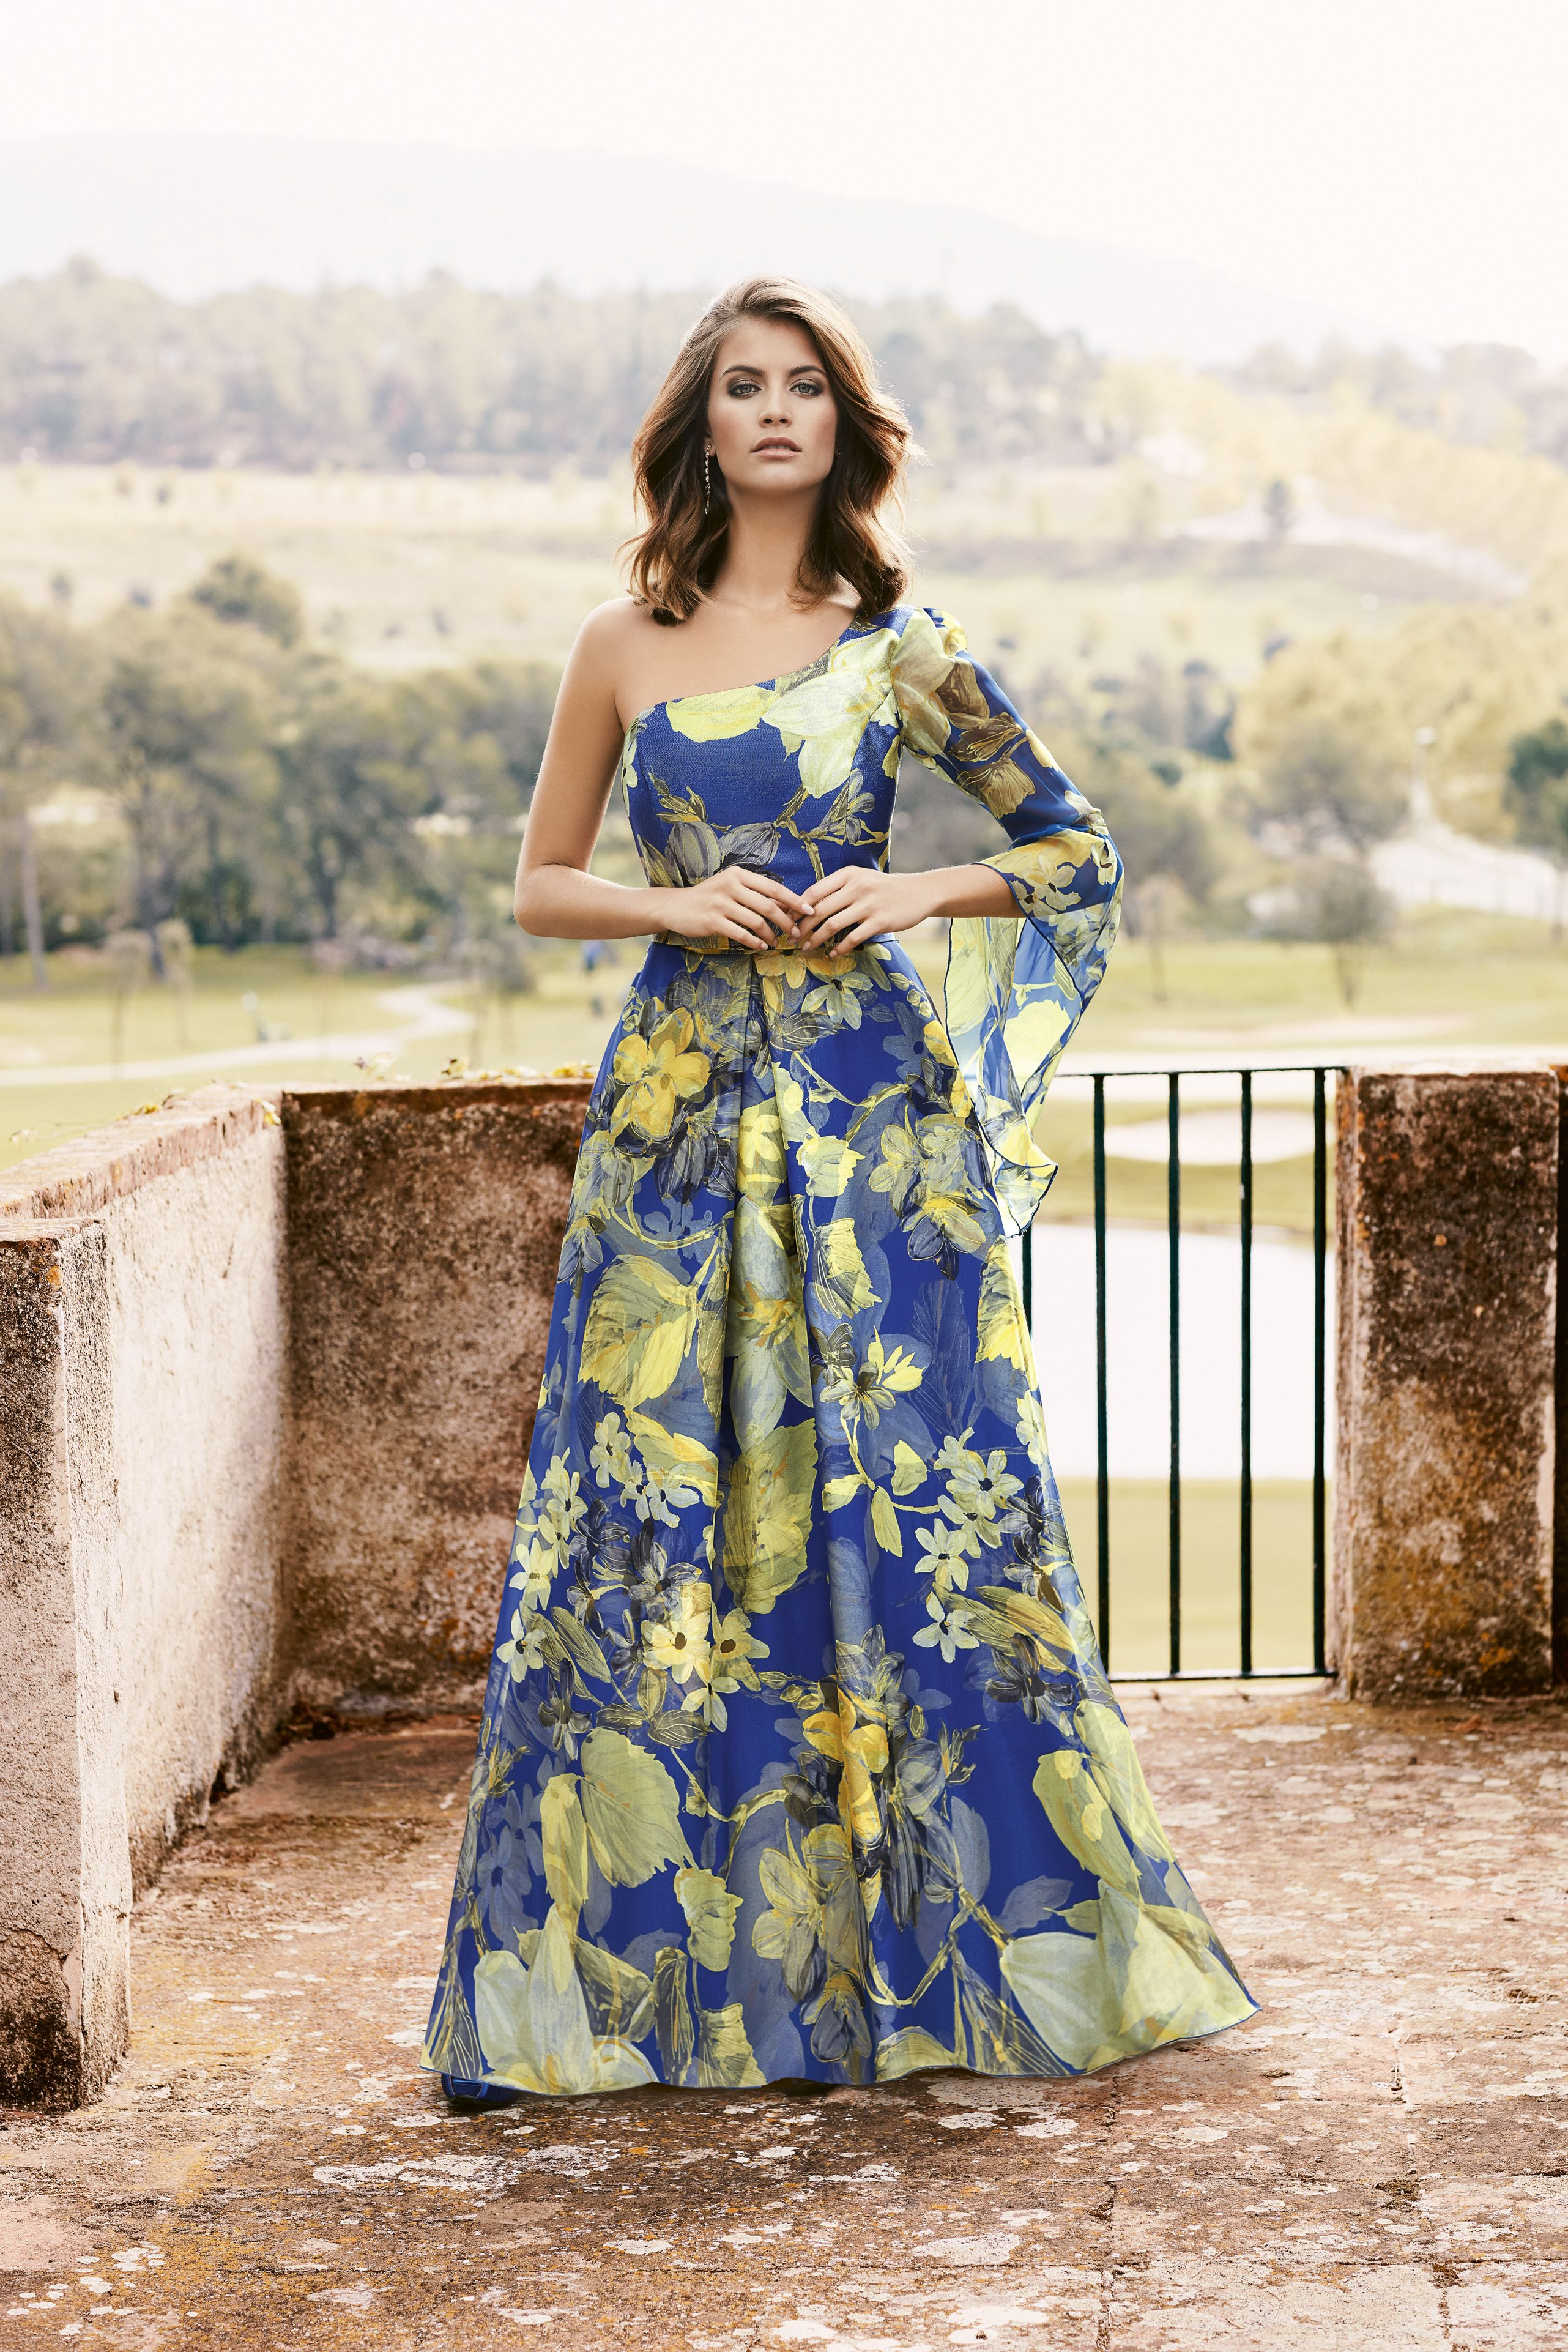 f755008a9 Nati Jimenez 2018 Modelo 746 Vestidos de madrina para este 2018 diferentes  . Vestido estampado de gasa